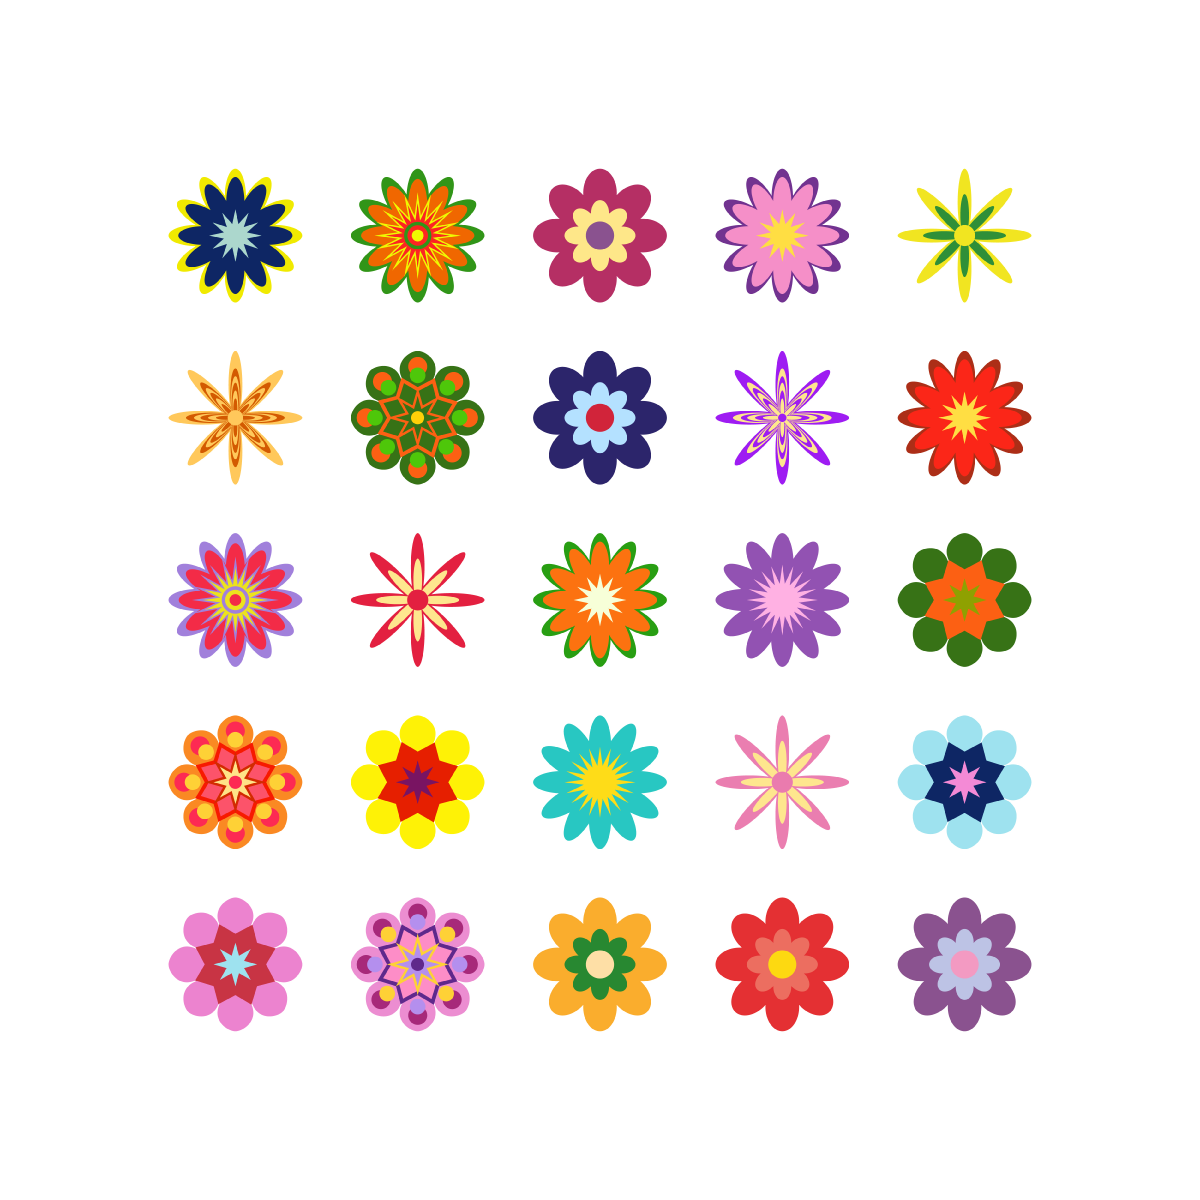 flowers_521732116